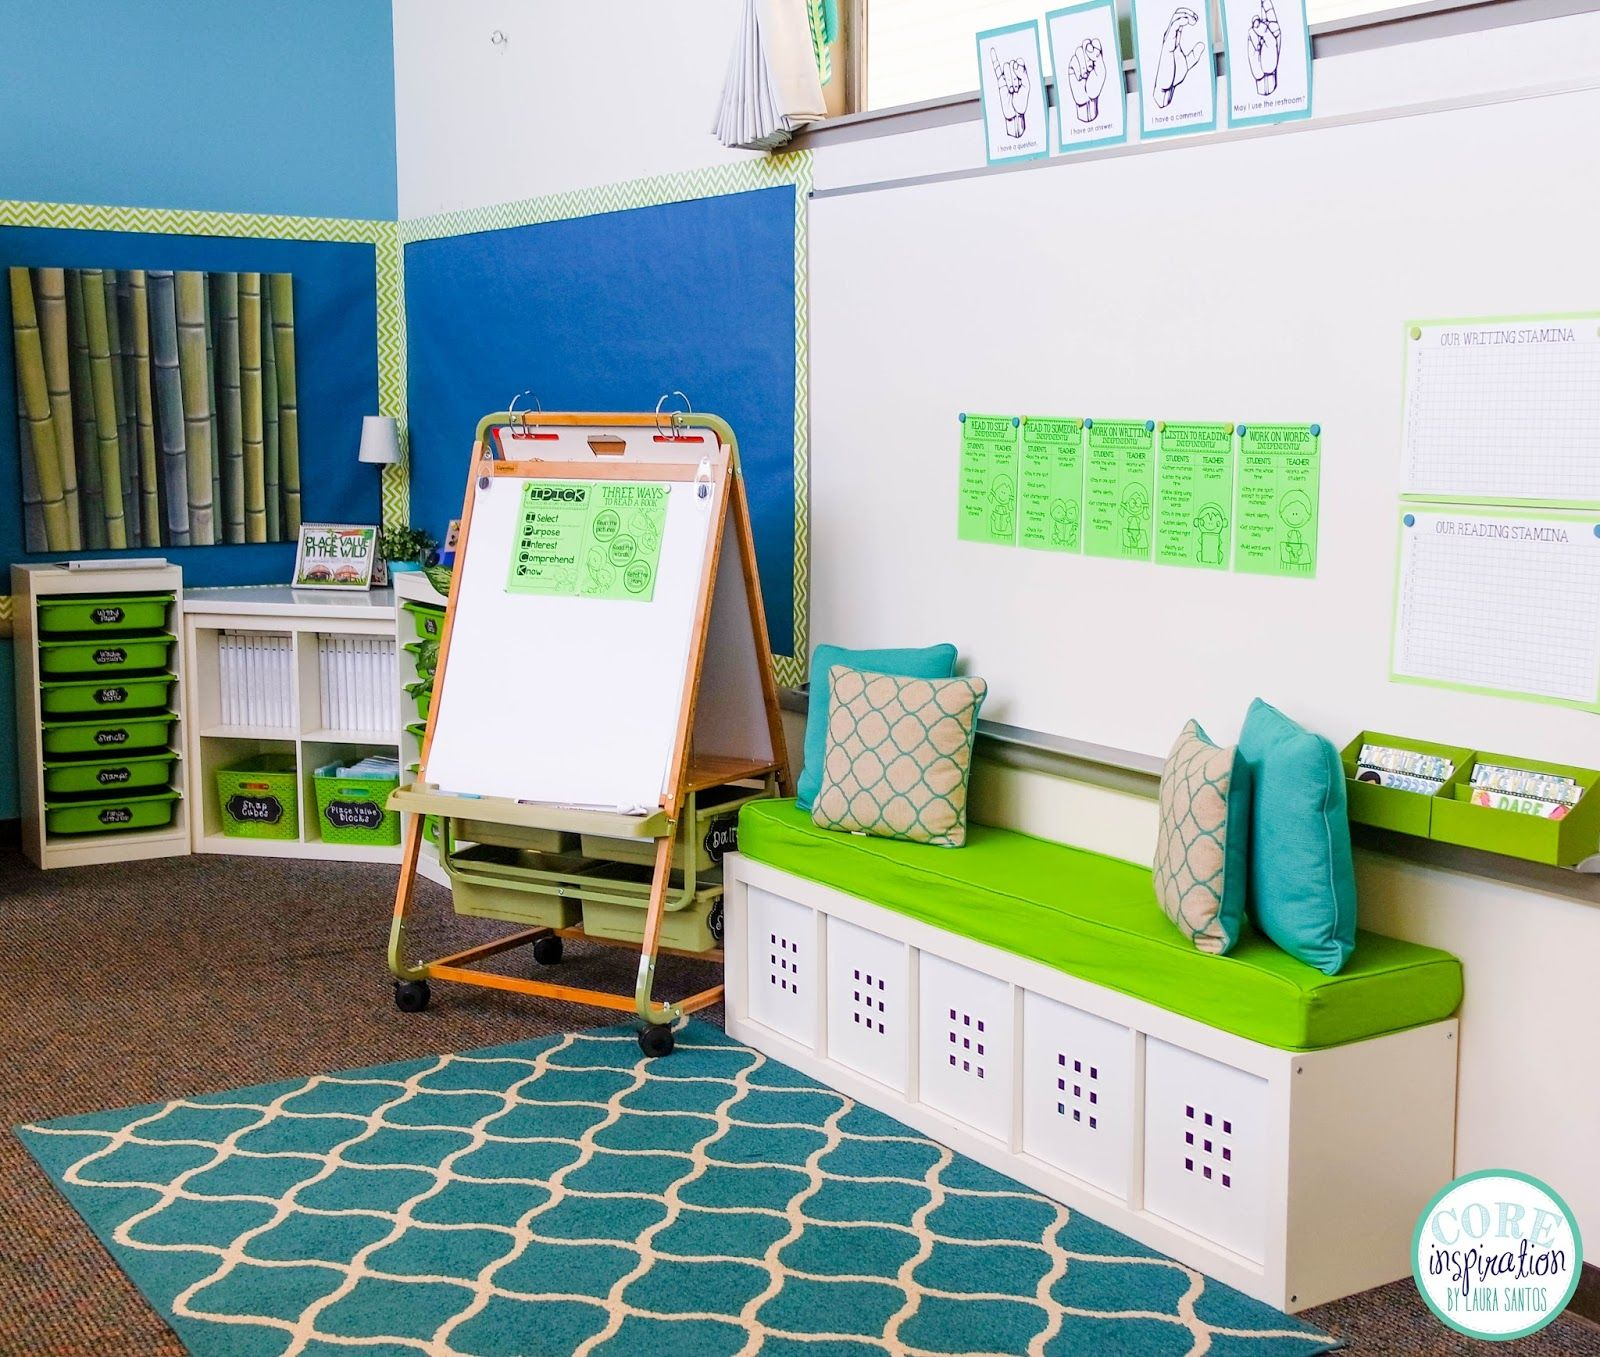 Preschool Classroom Design: Core Inspiration By Laura Santos: Classroom Reveal 2015